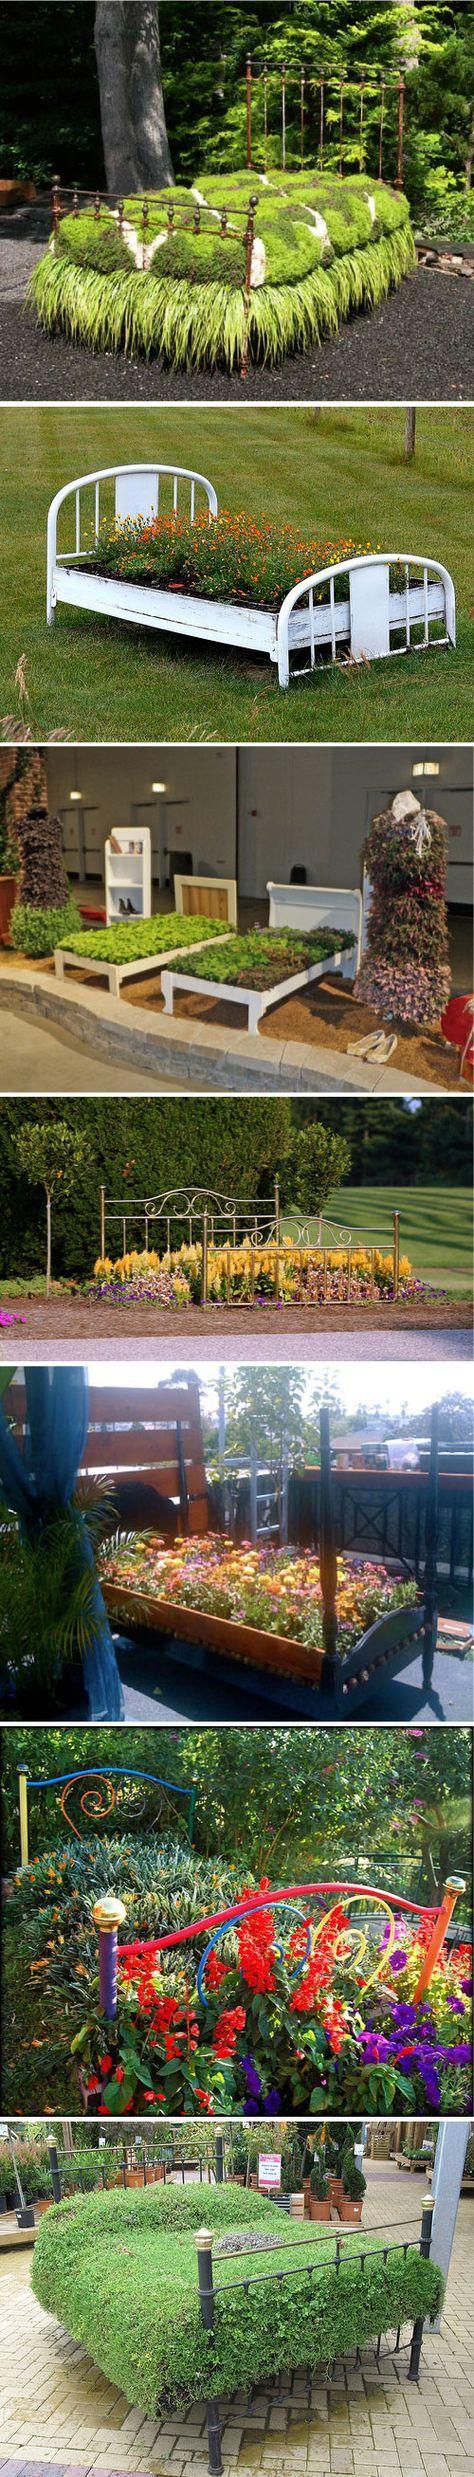 Des Lits Dignes Du Jardin D Eden Garden Beds Diy Garden Garden Design